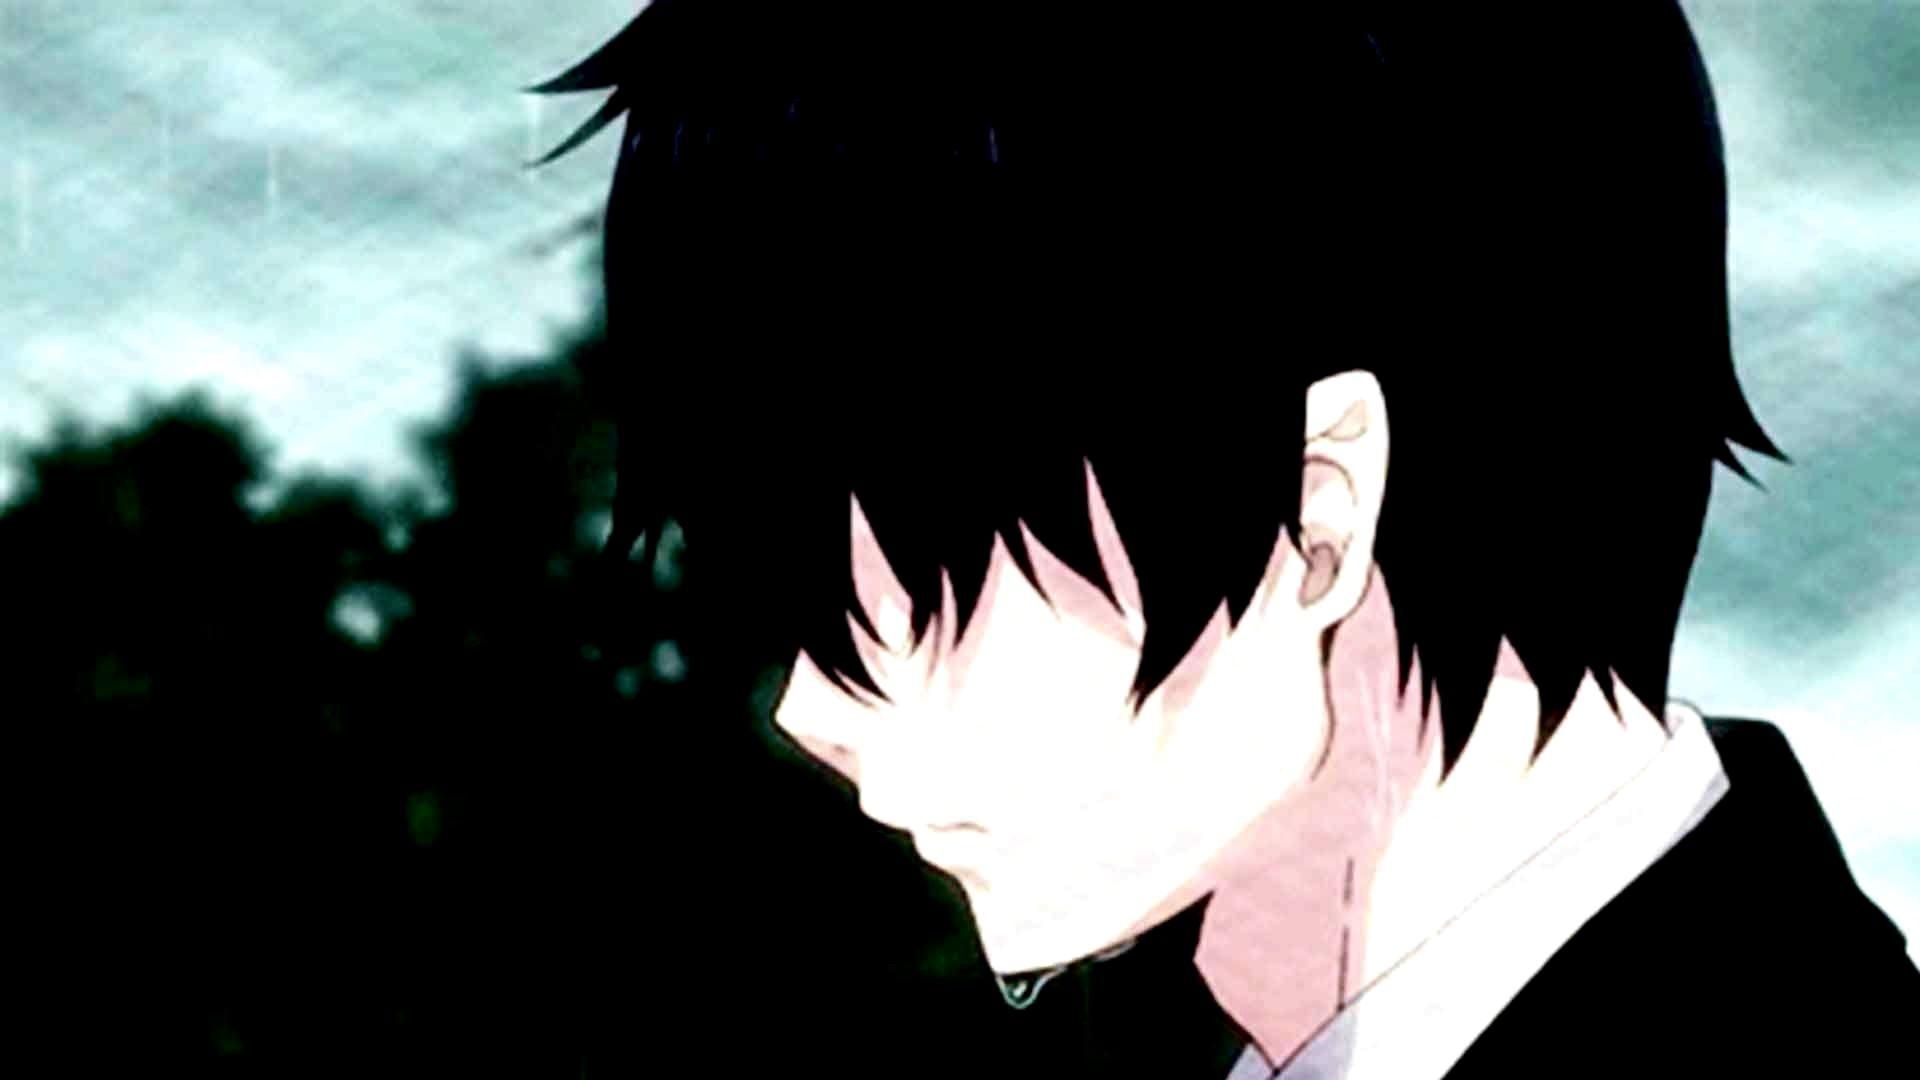 Anime Boy Wallpaper 4k Phone Gallery Di 2020 Gambar Animasi Gambar Anime